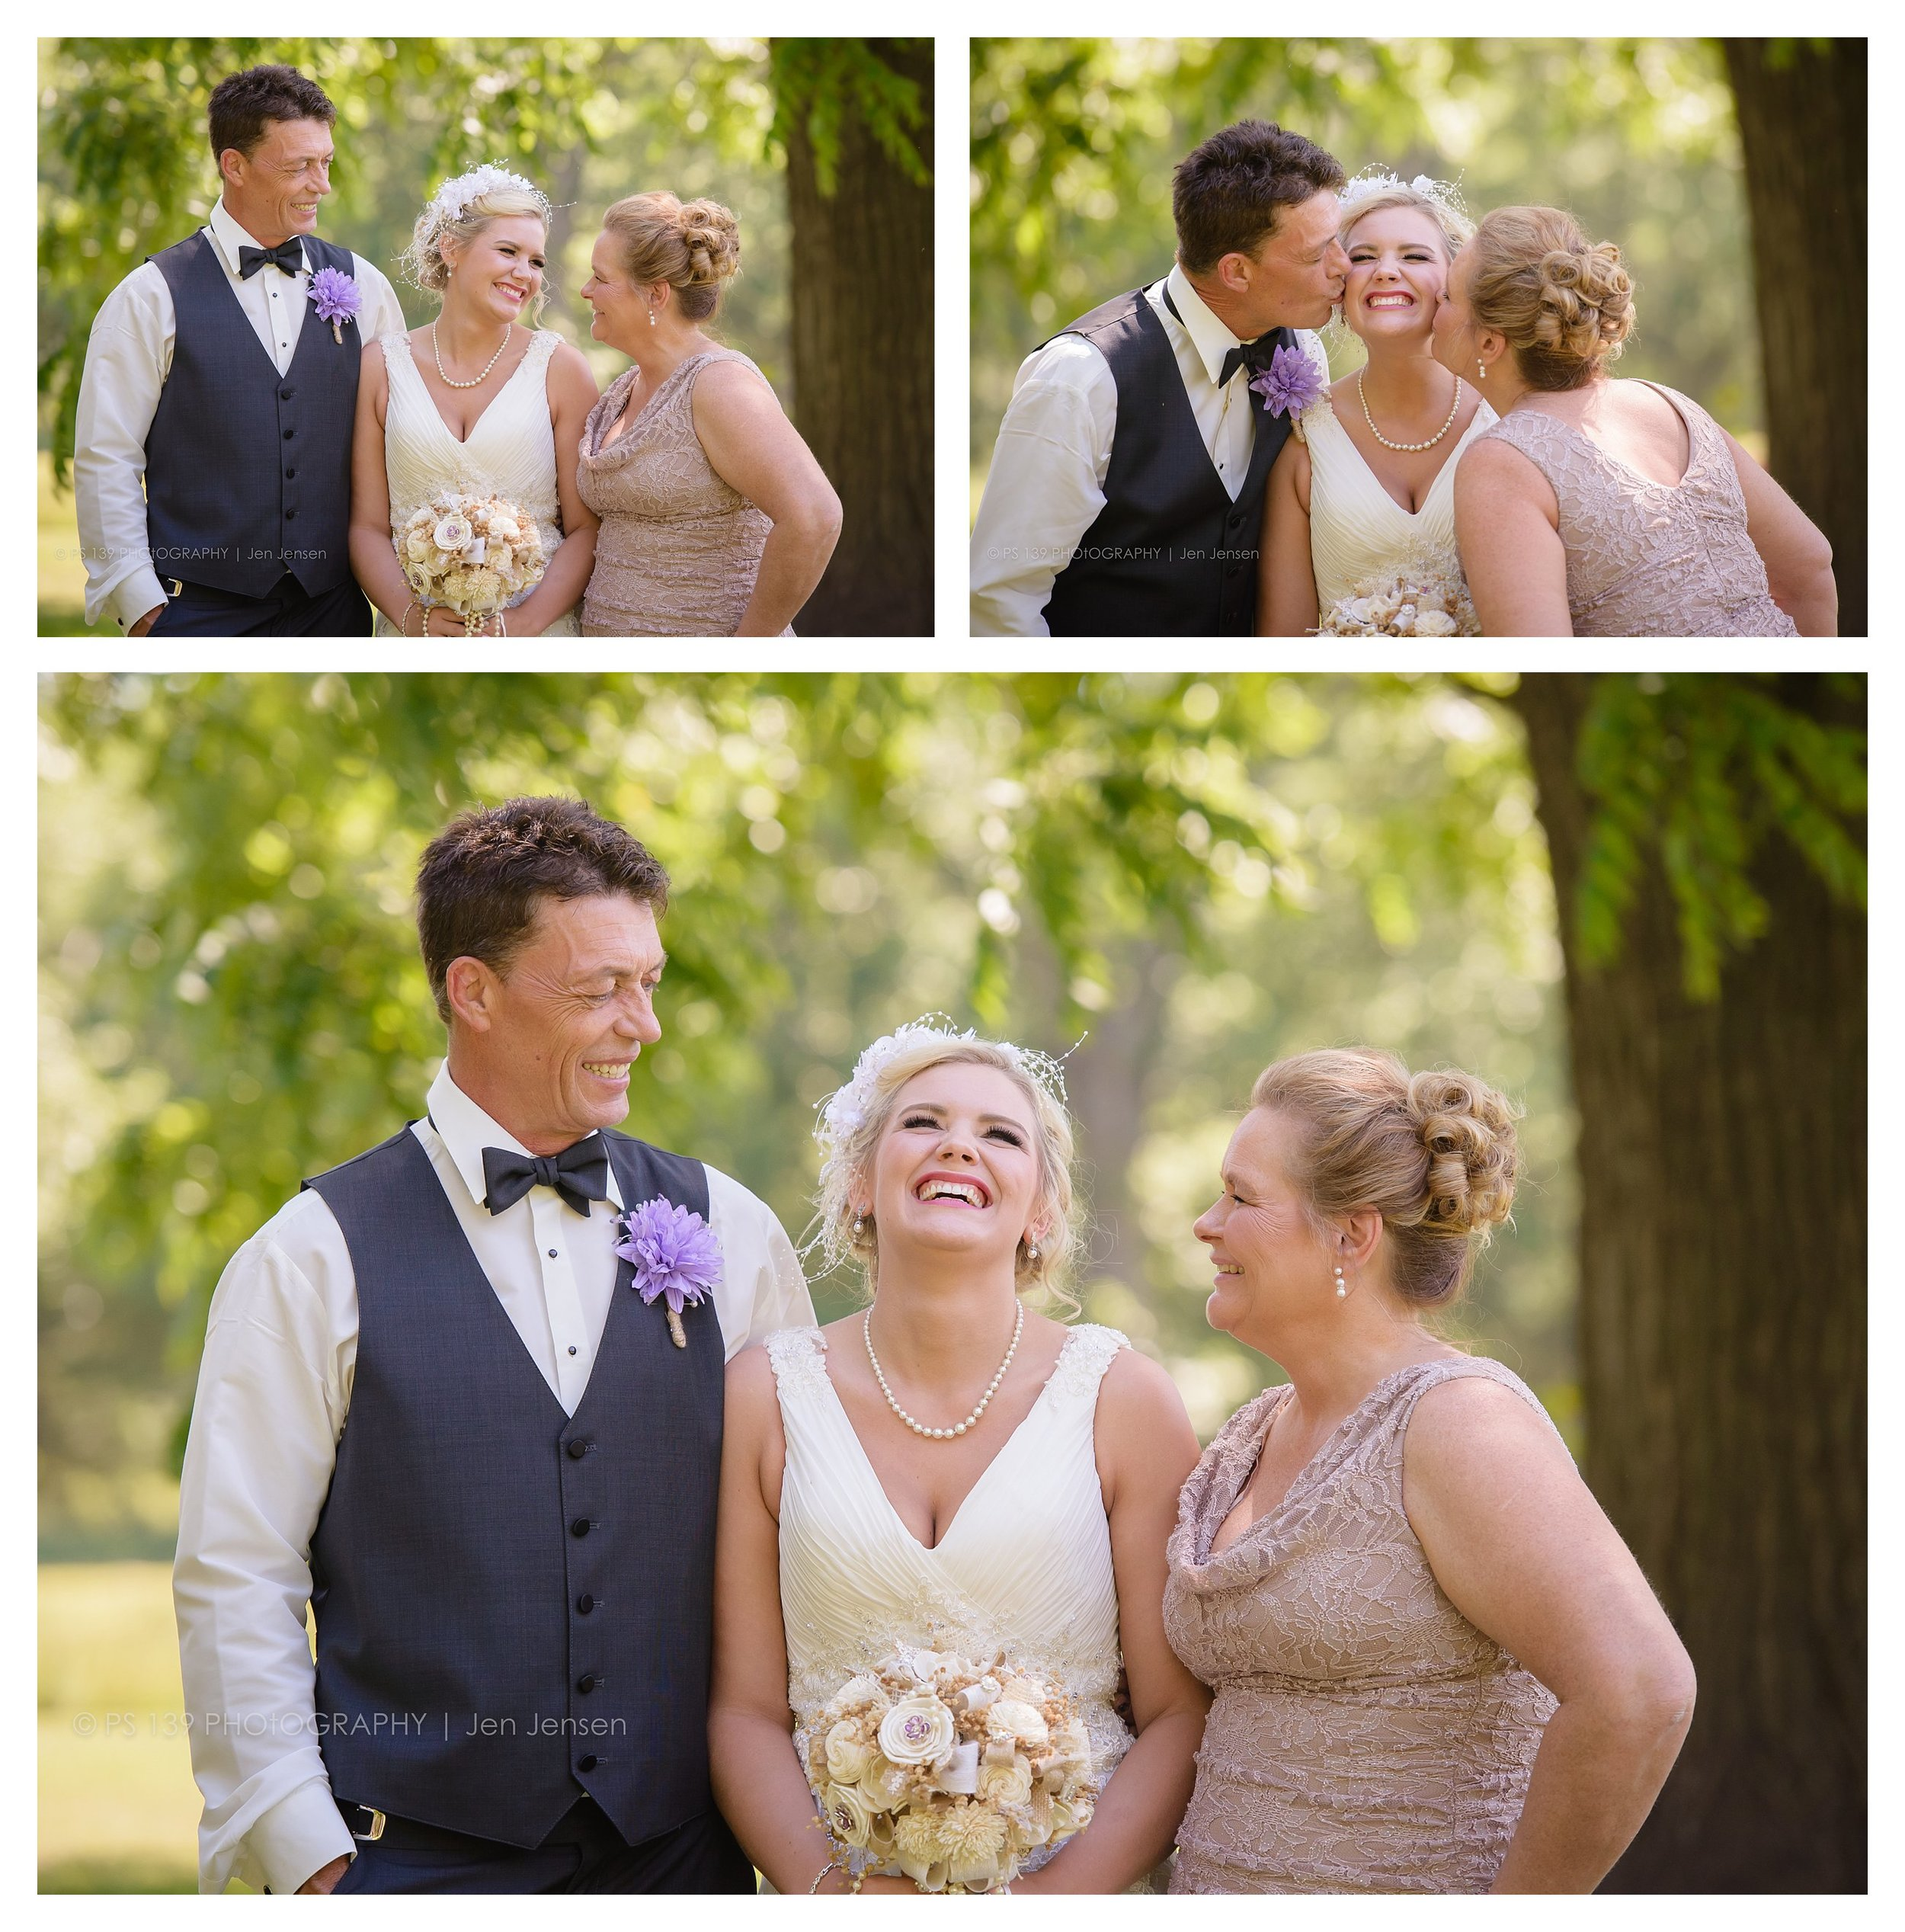 oregon Illinois oak lane farm wisconsin wedding photographer bayfield wi ps 139 photography jen jensen_0264.jpg